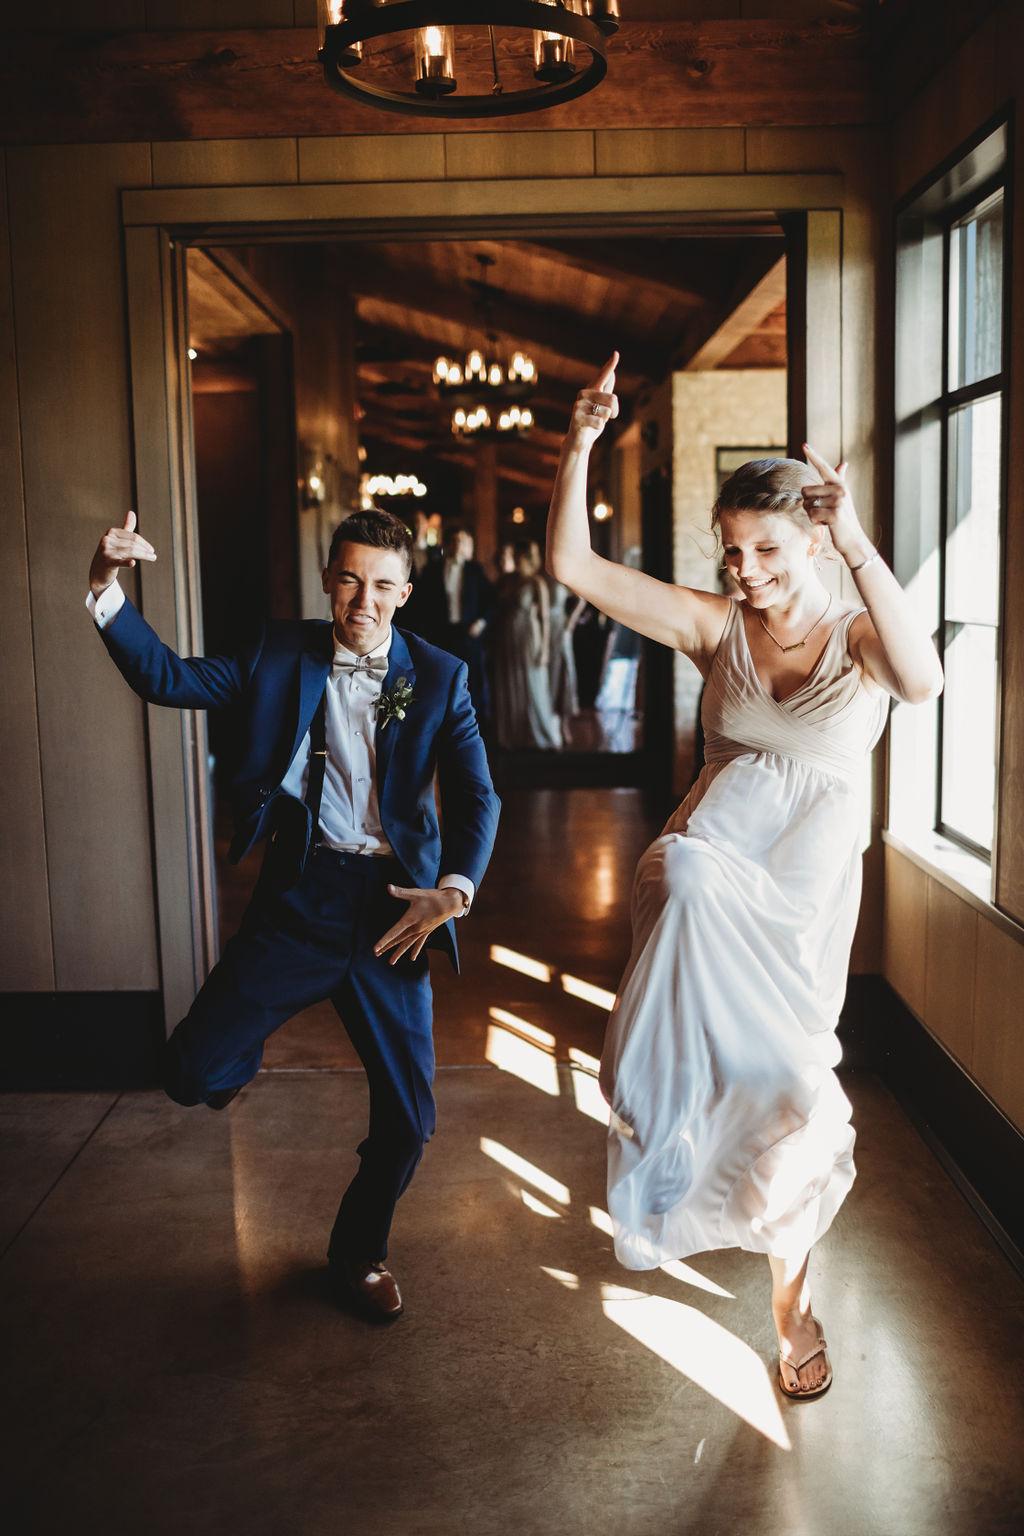 engle-olson-katie-dalton-wedding-clewell-photography-27.jpg